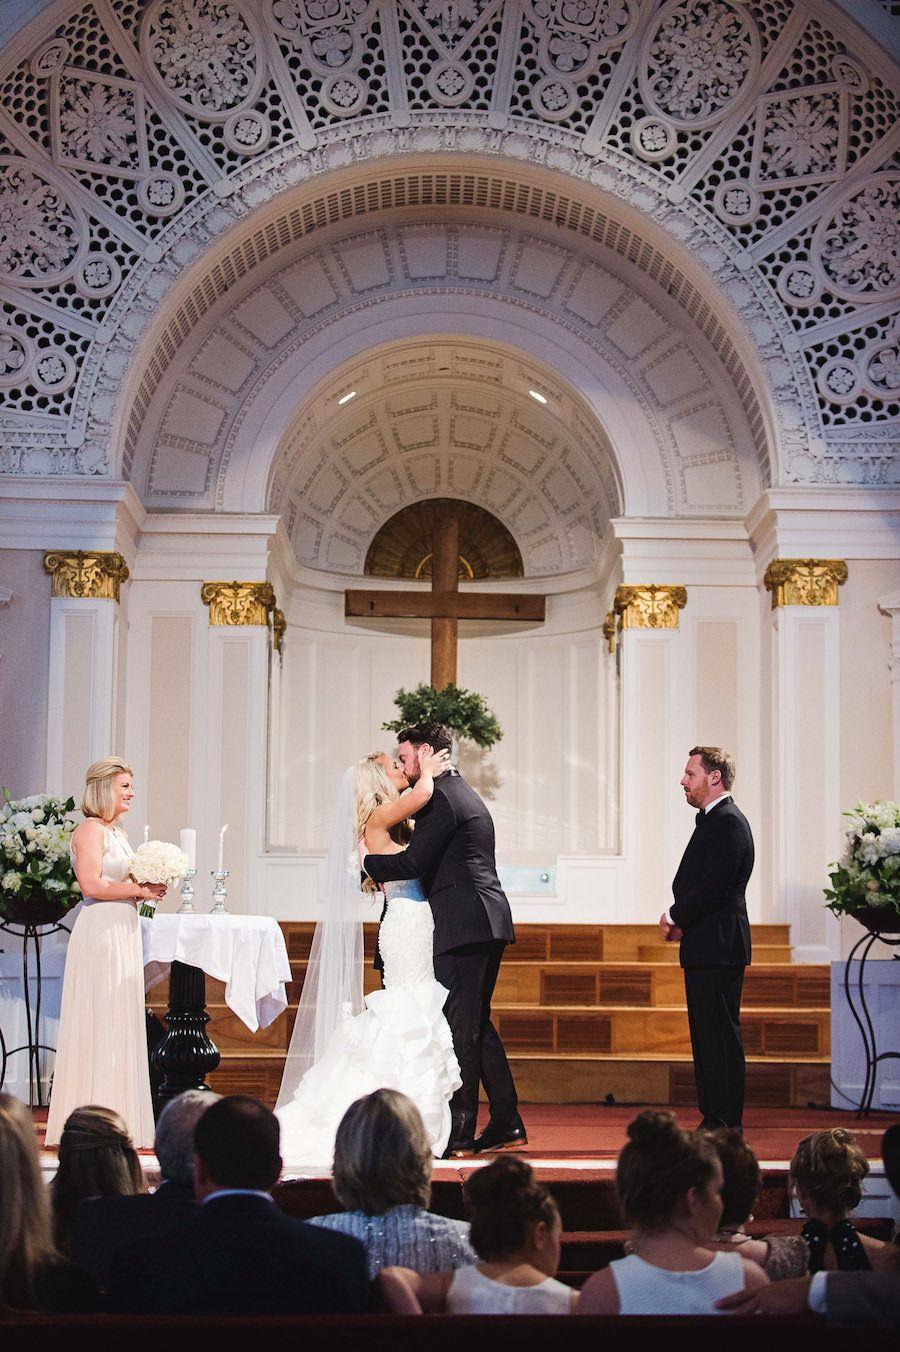 Glamorous Champagne Downtown Tampa Destination Wedding The Vault Ballroom Wedding Wedding Destination Wedding